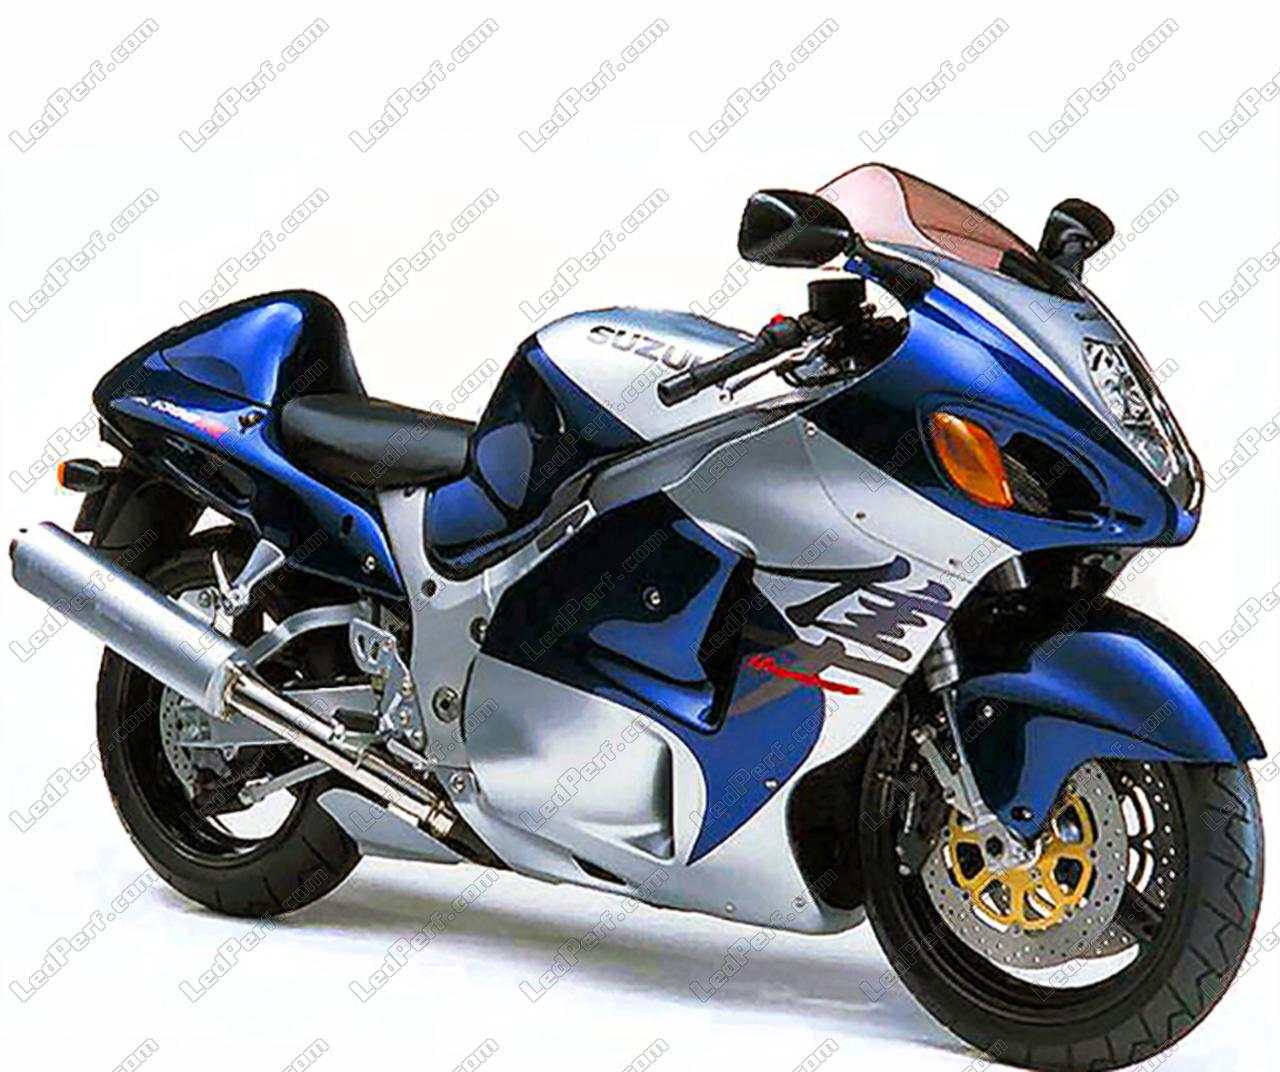 Additional LED headlights for motorcycle Suzuki Hayabusa 1300 (1999 on